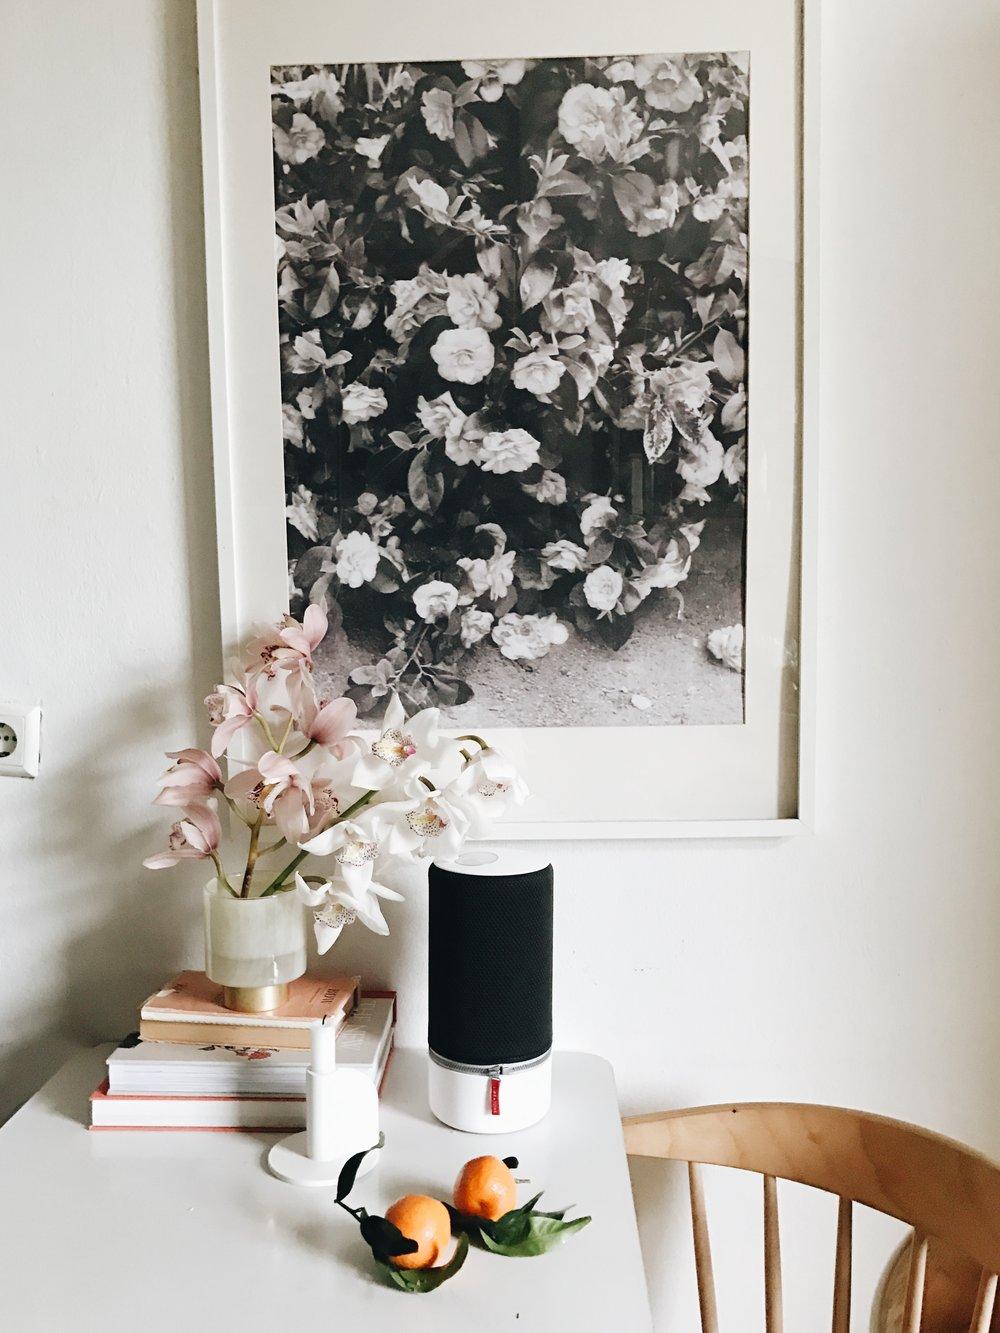 Studio Essentials: Libratone Lautsprecher